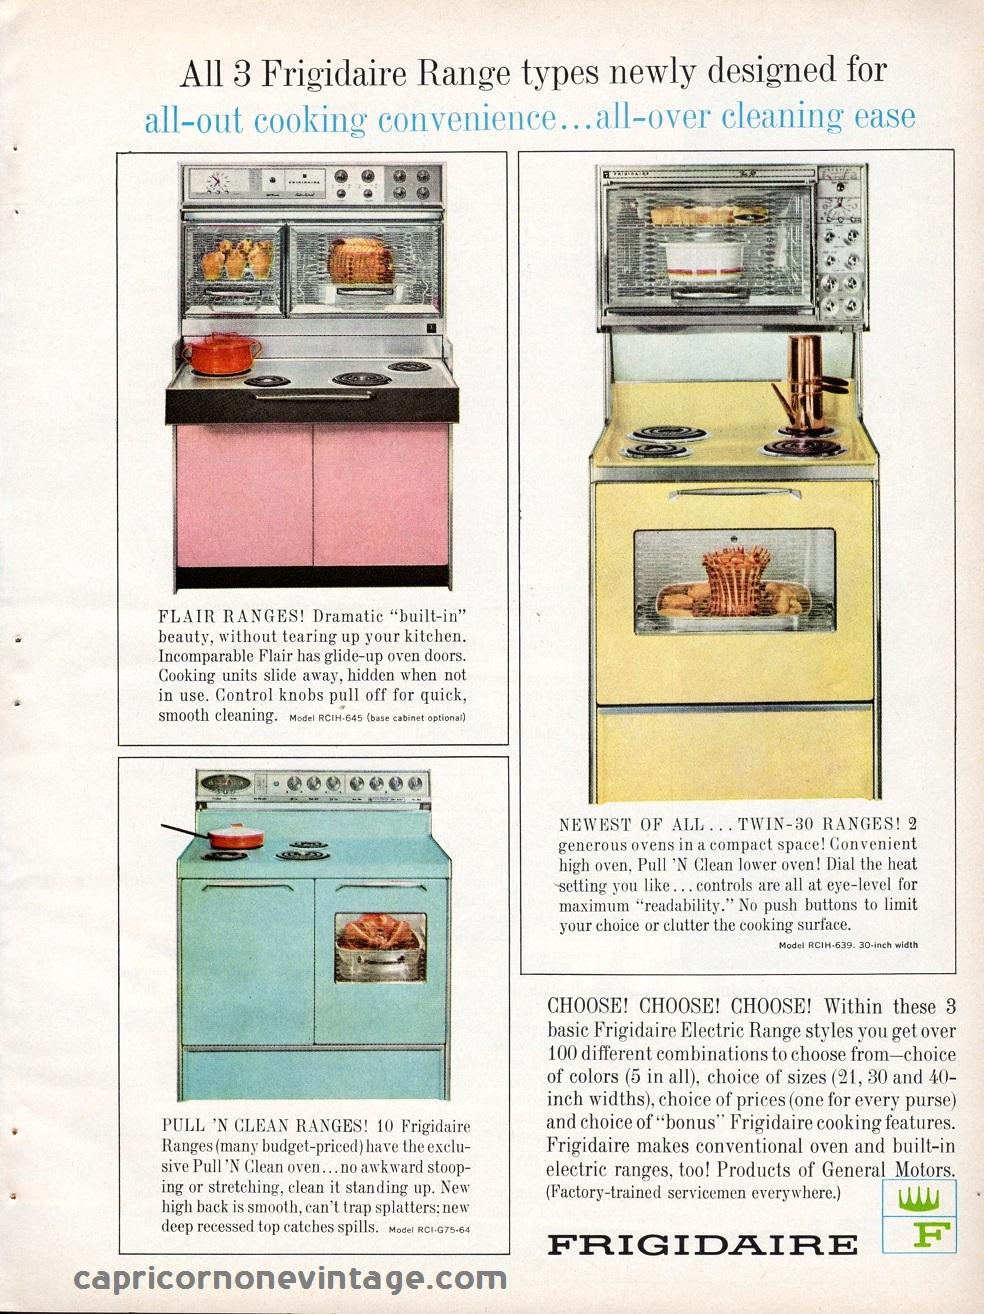 1964 frigidaire oven magazine ad mid century stove vintage advertising retro - Range magazine mural ...